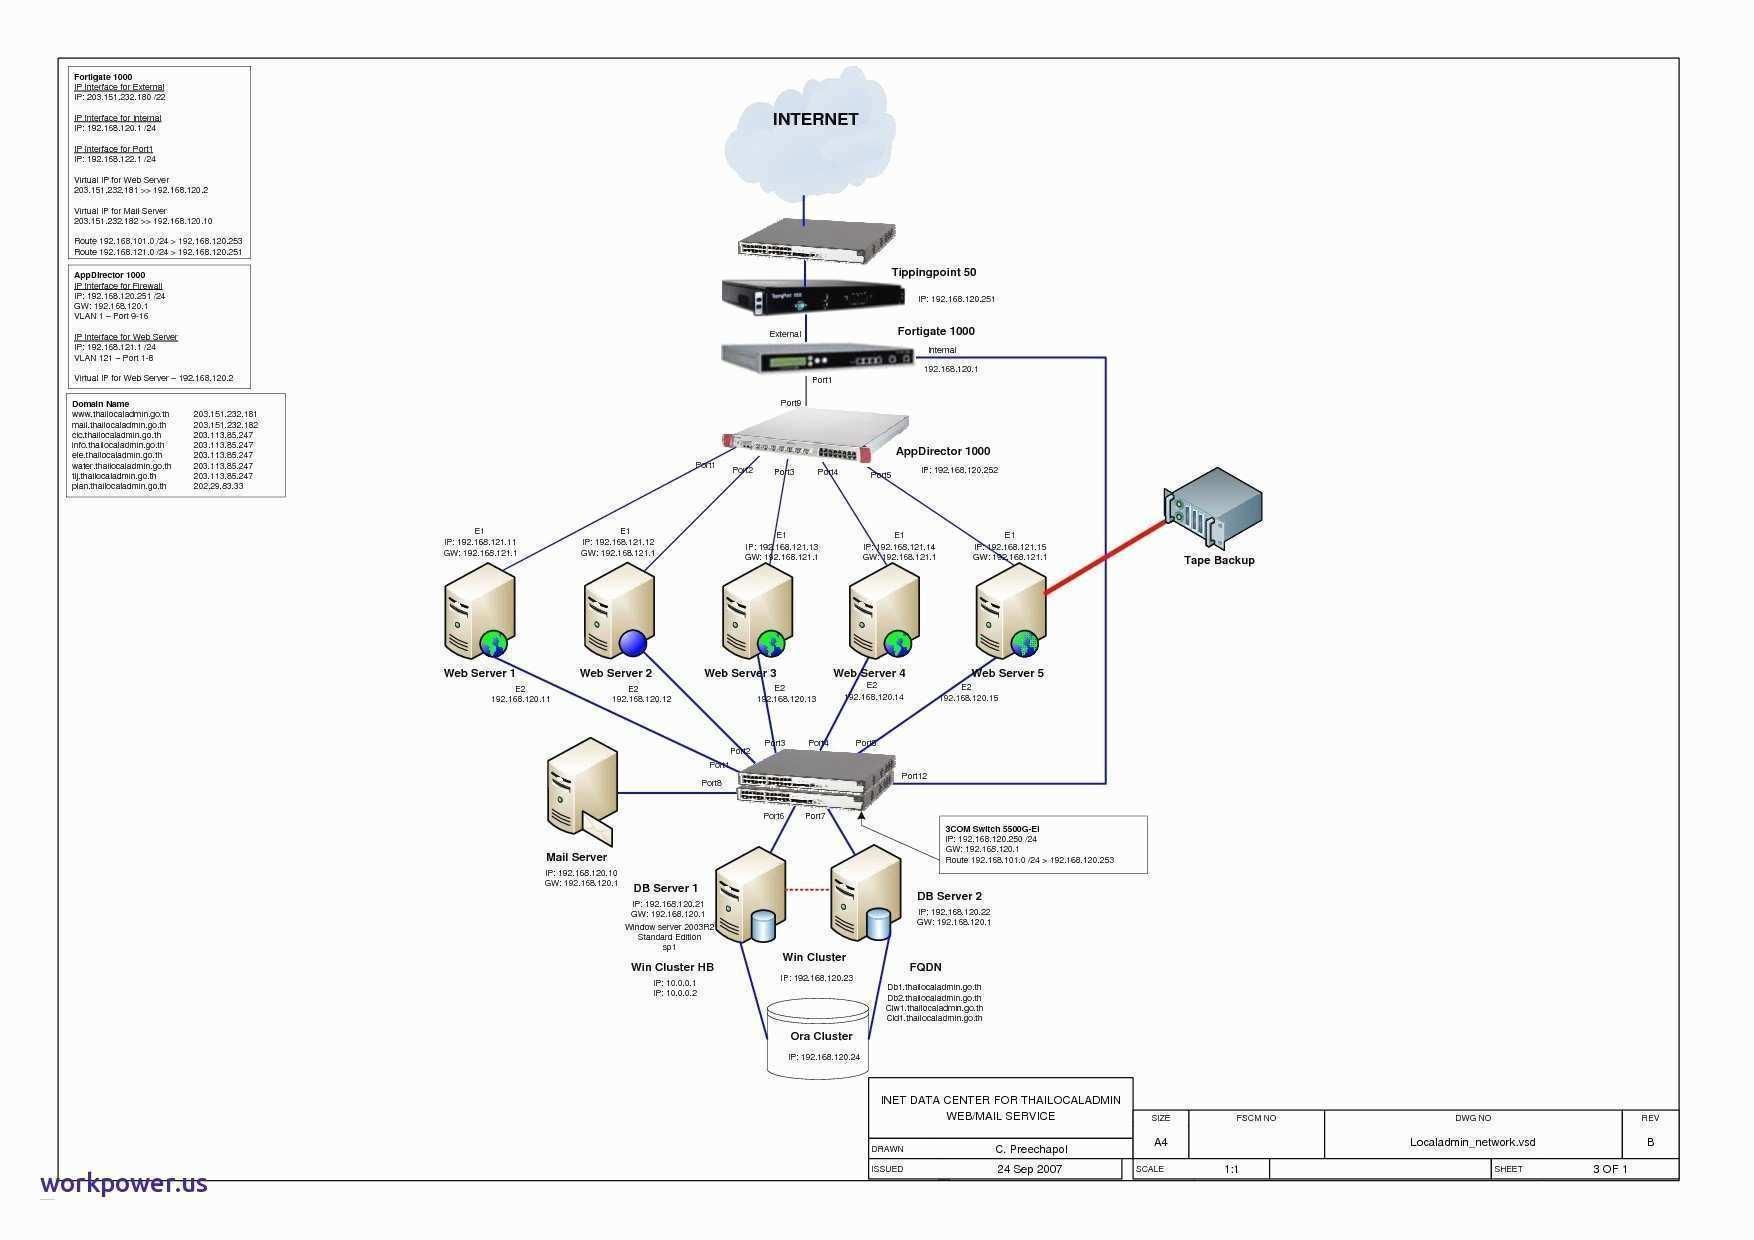 Free Visio Network Diagram Templates